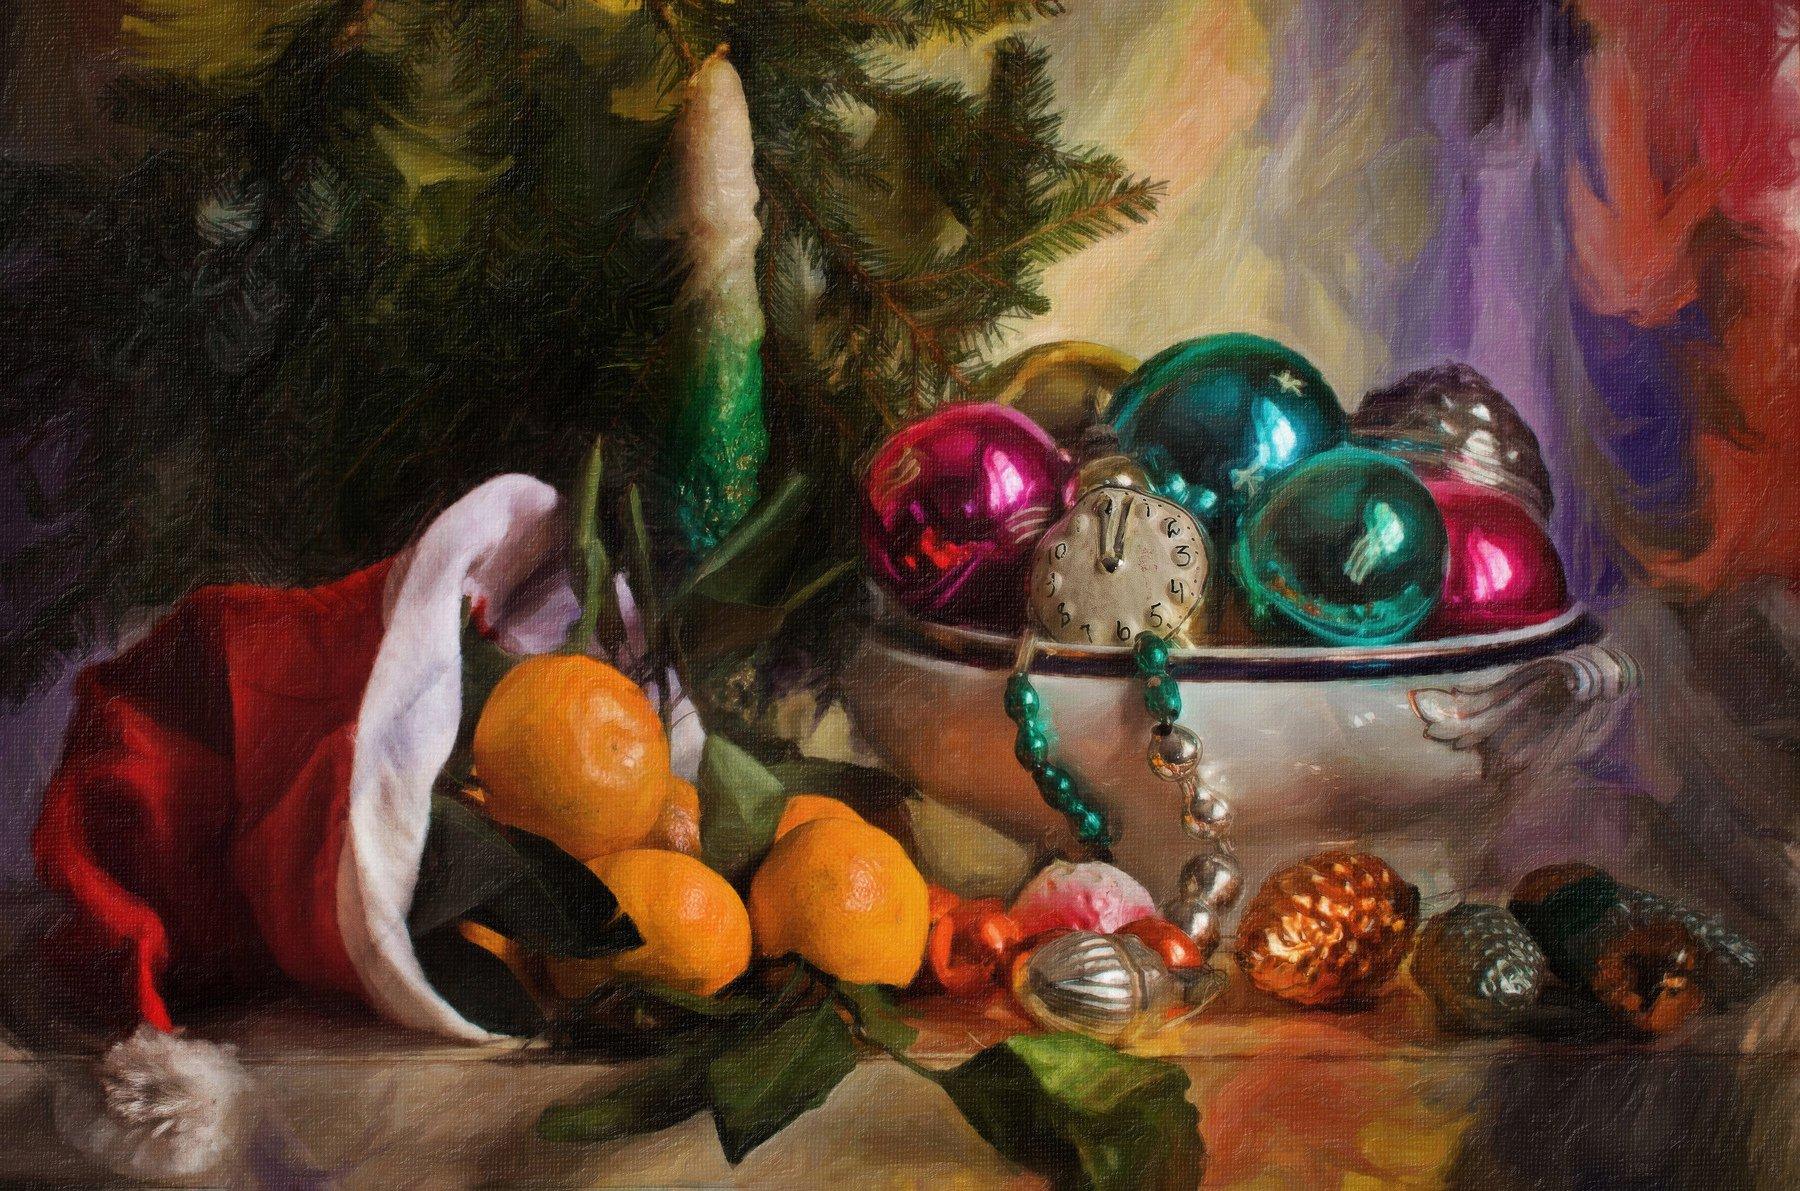 натюрморт, стекло, фарфор, игрушки, мандарины, ёлка, новый год, Анна Петина